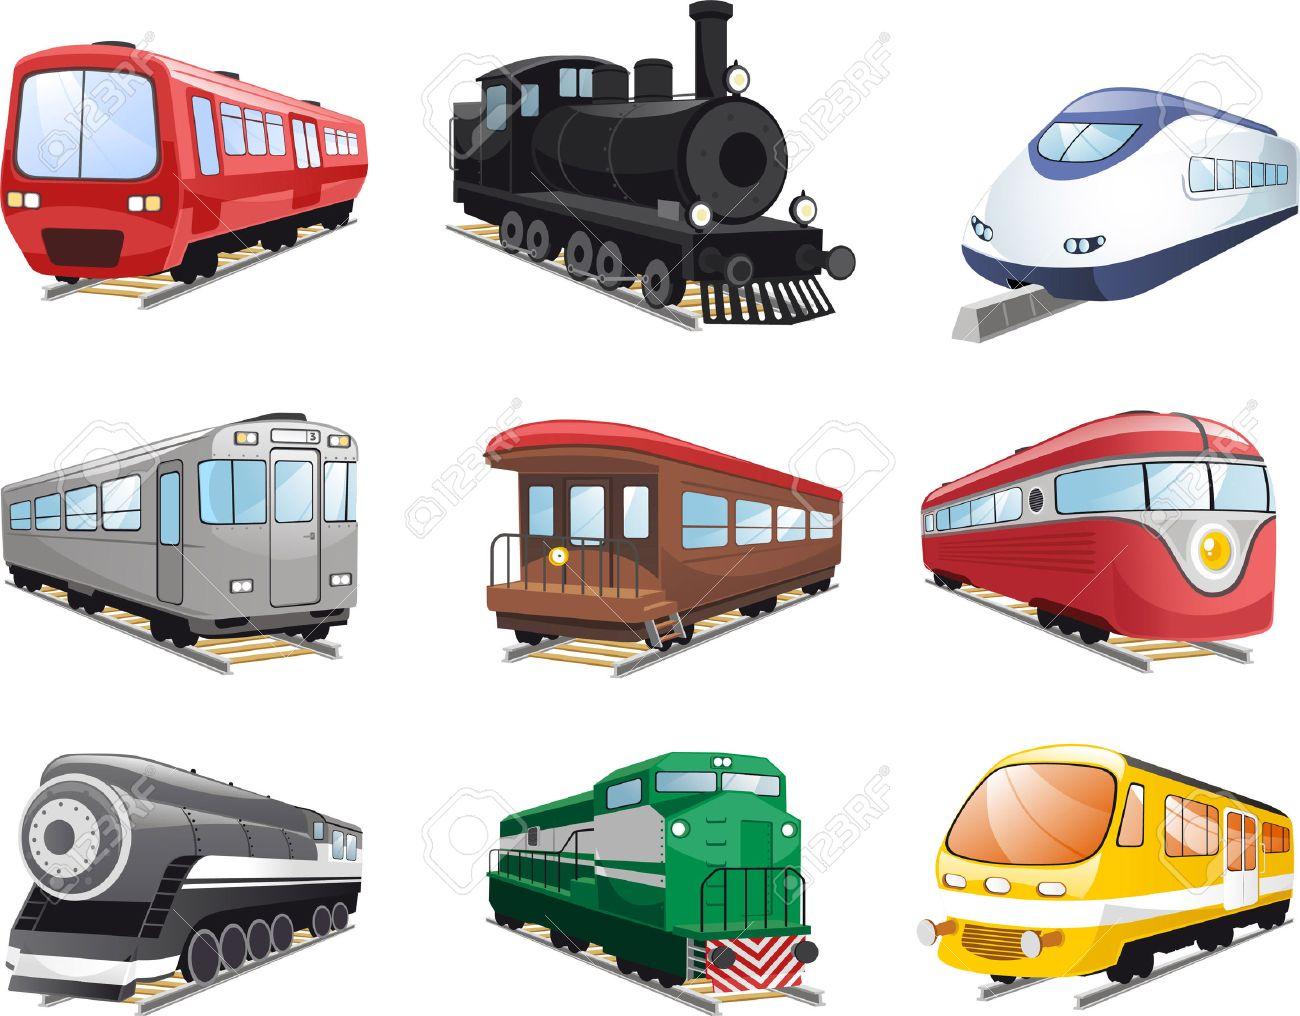 Train Engine Cartoon Illustrations Royalty Free Cliparts Vectors